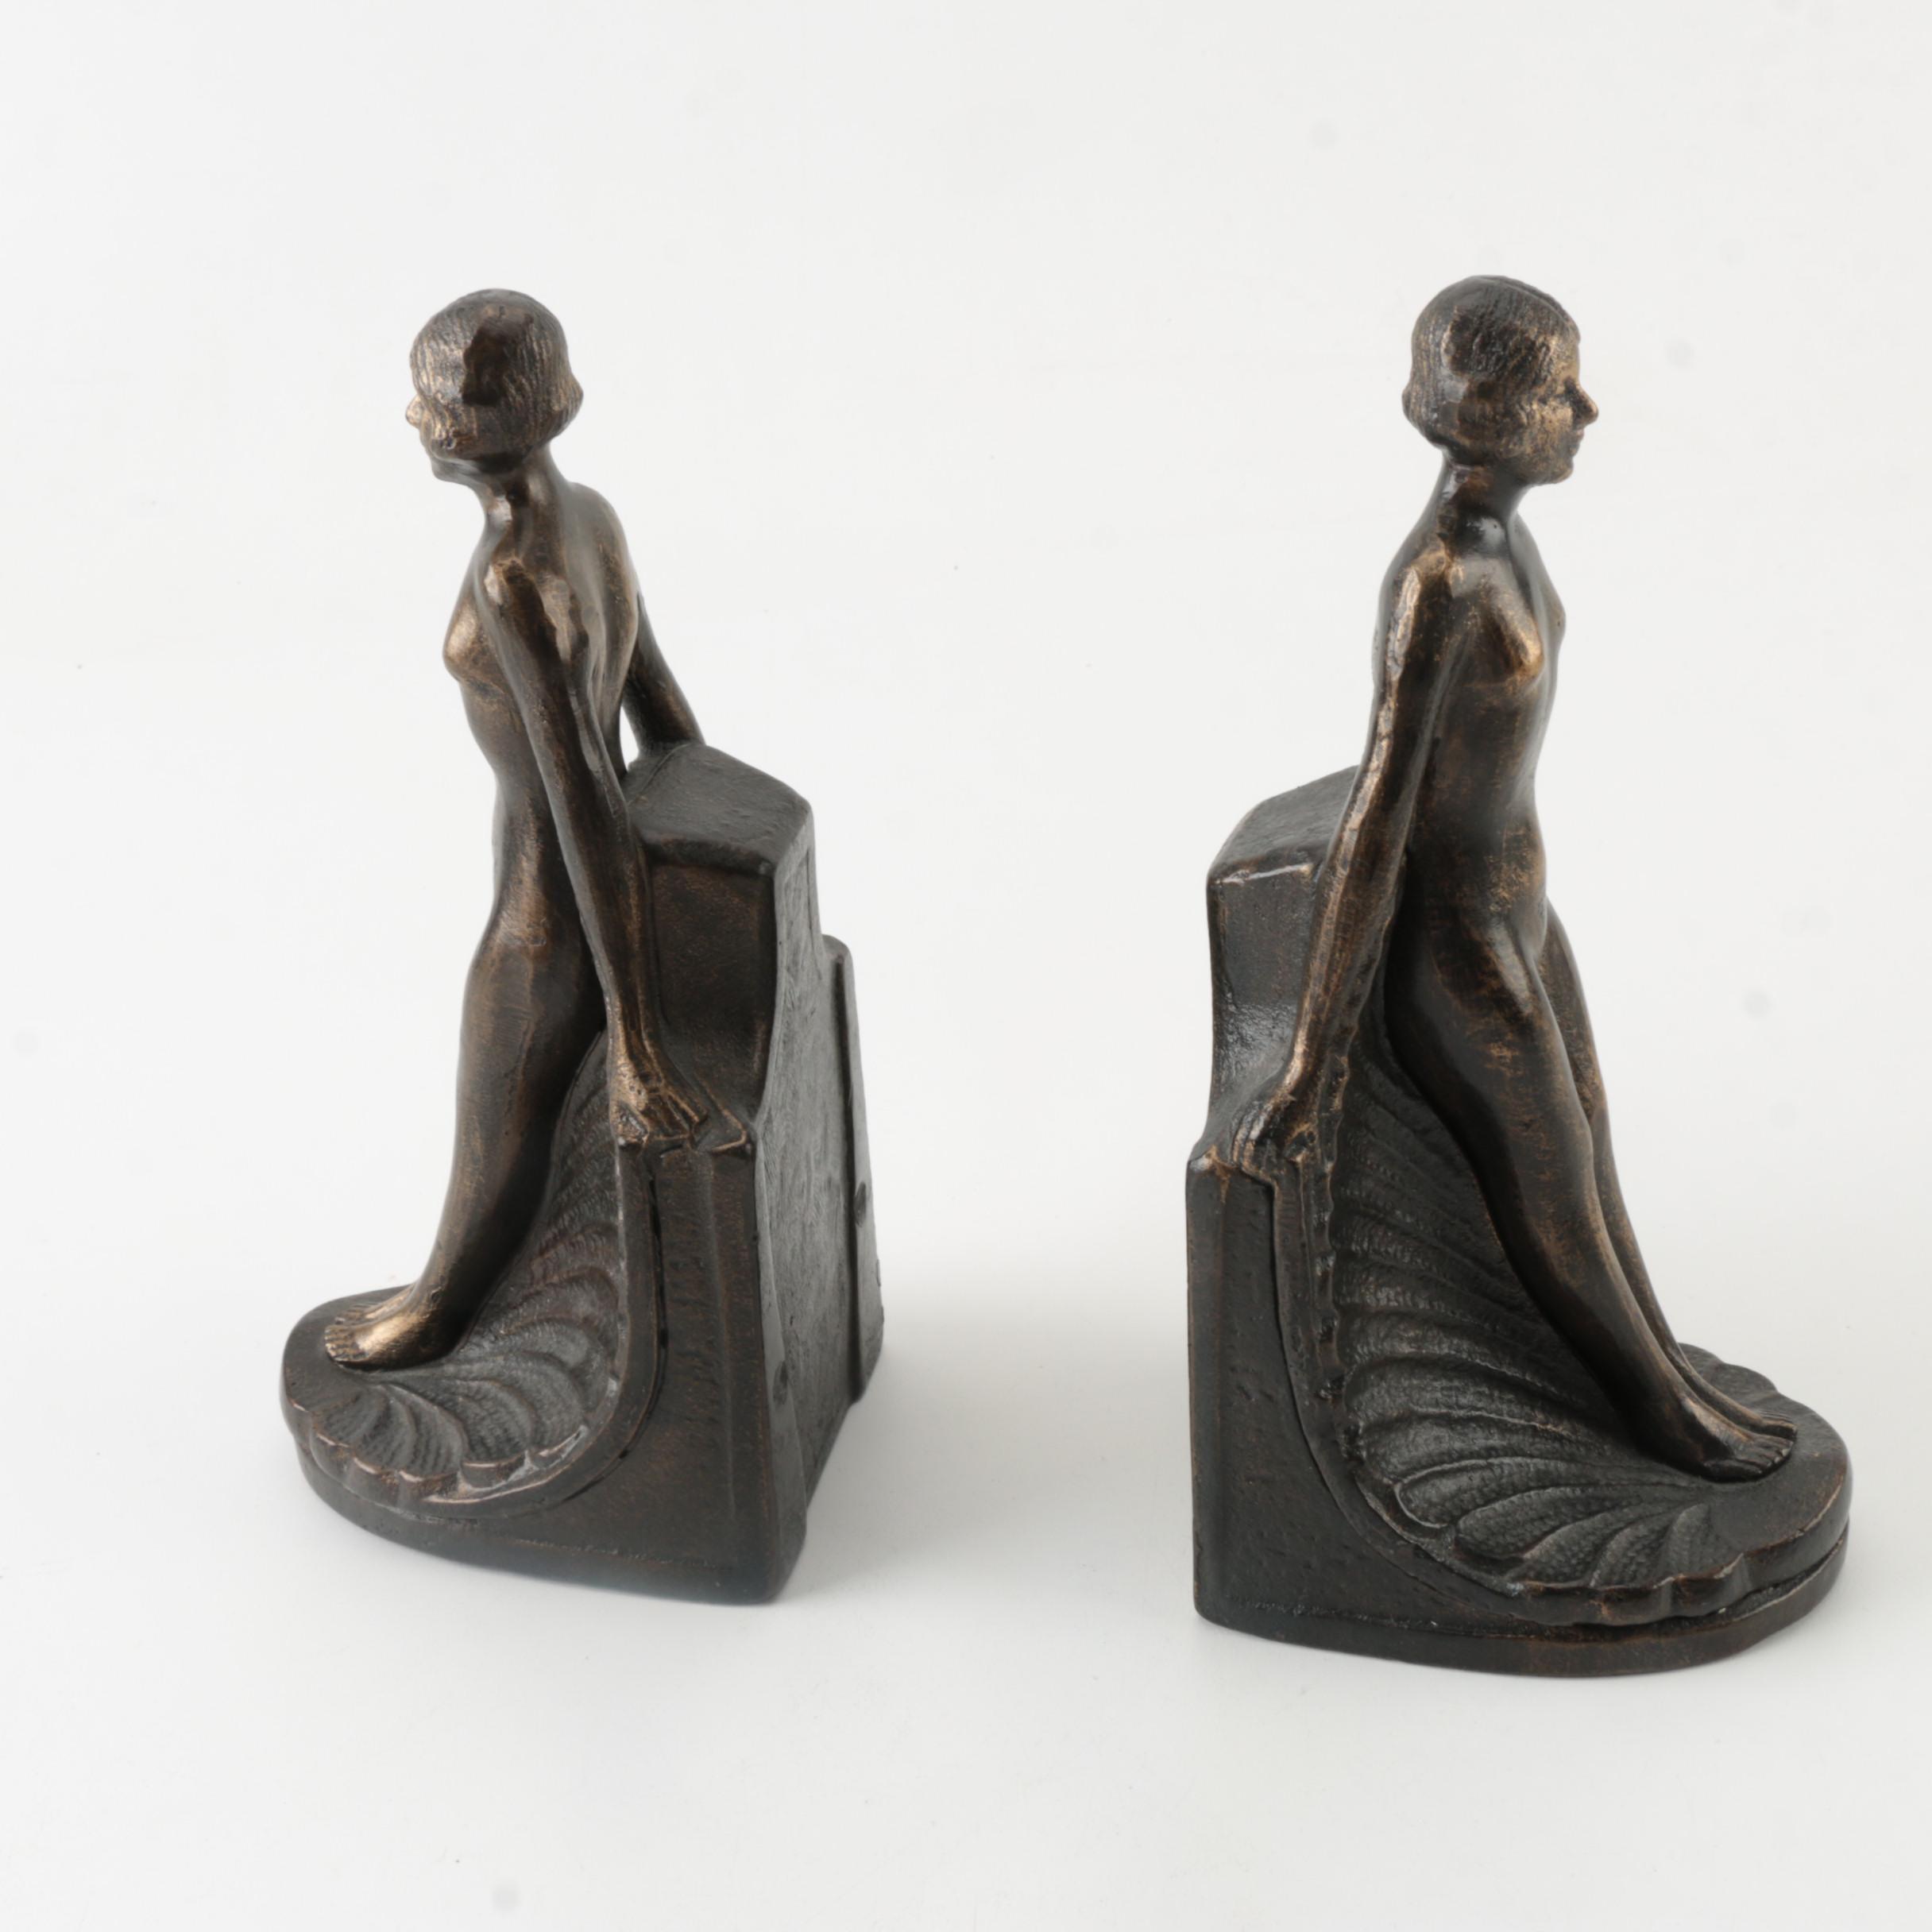 Female Figural Art Deco Style Bookends